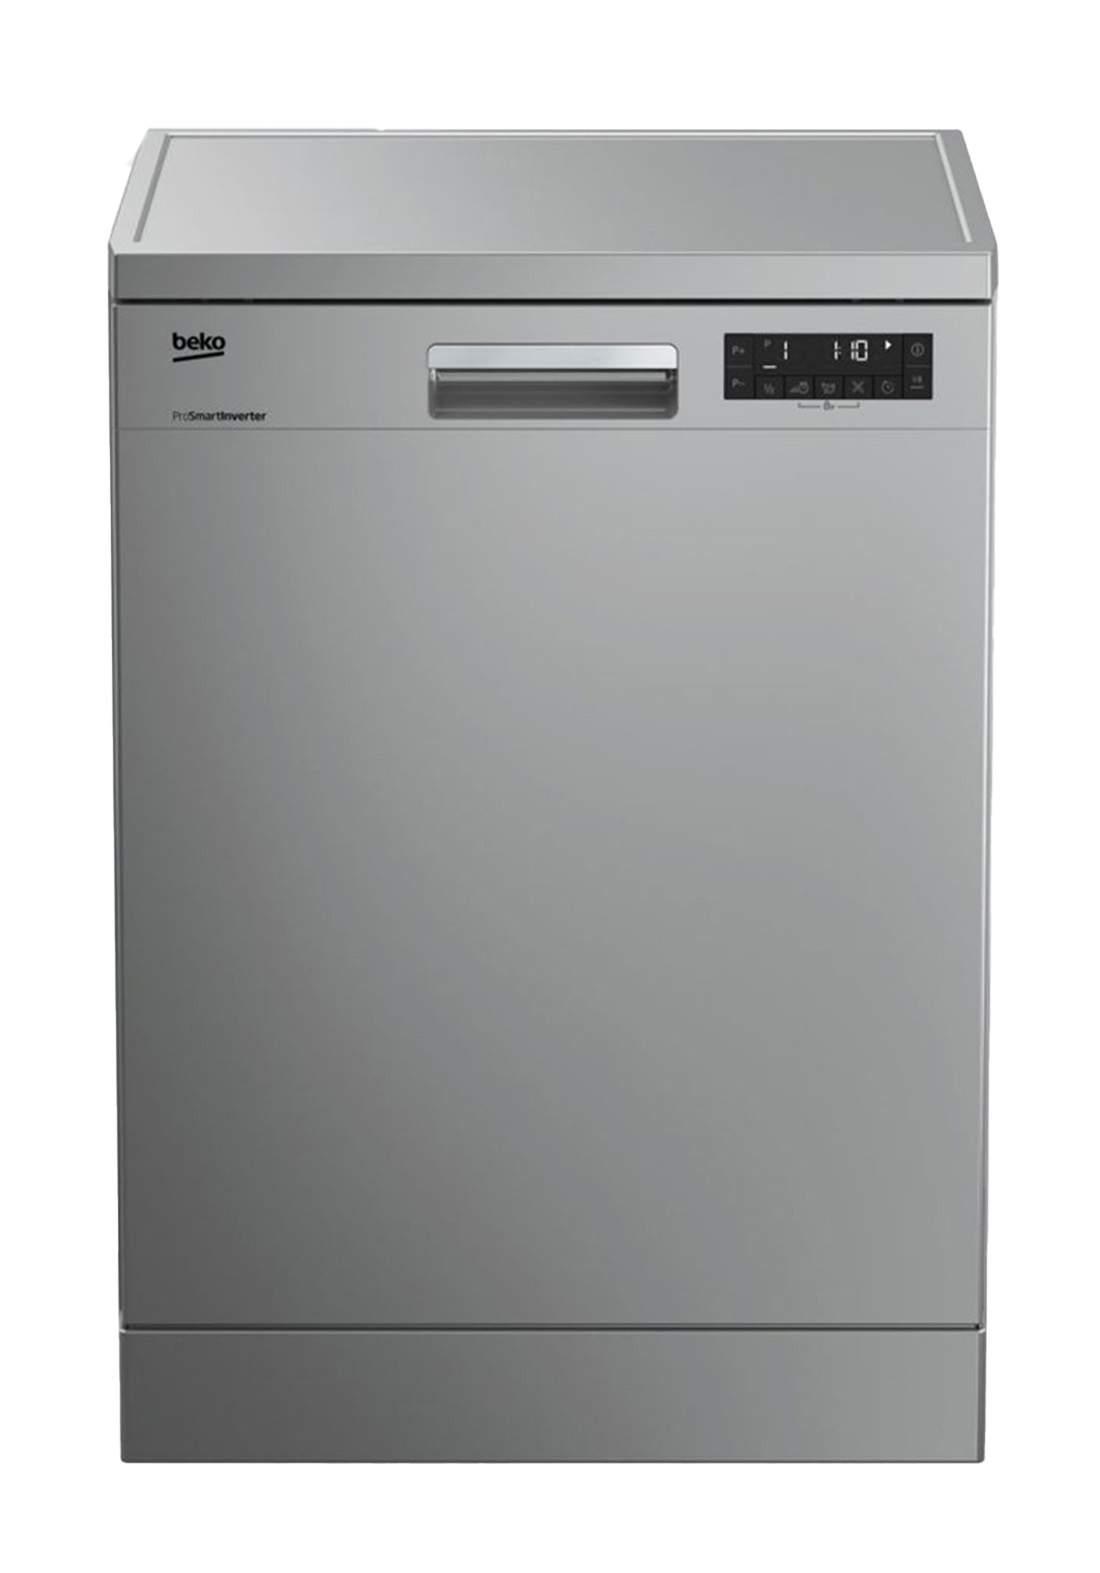 Beko DFN 28422S Dishwasher 8 Programs Capacity Of 14 Sets - Gray  غسالة صحون